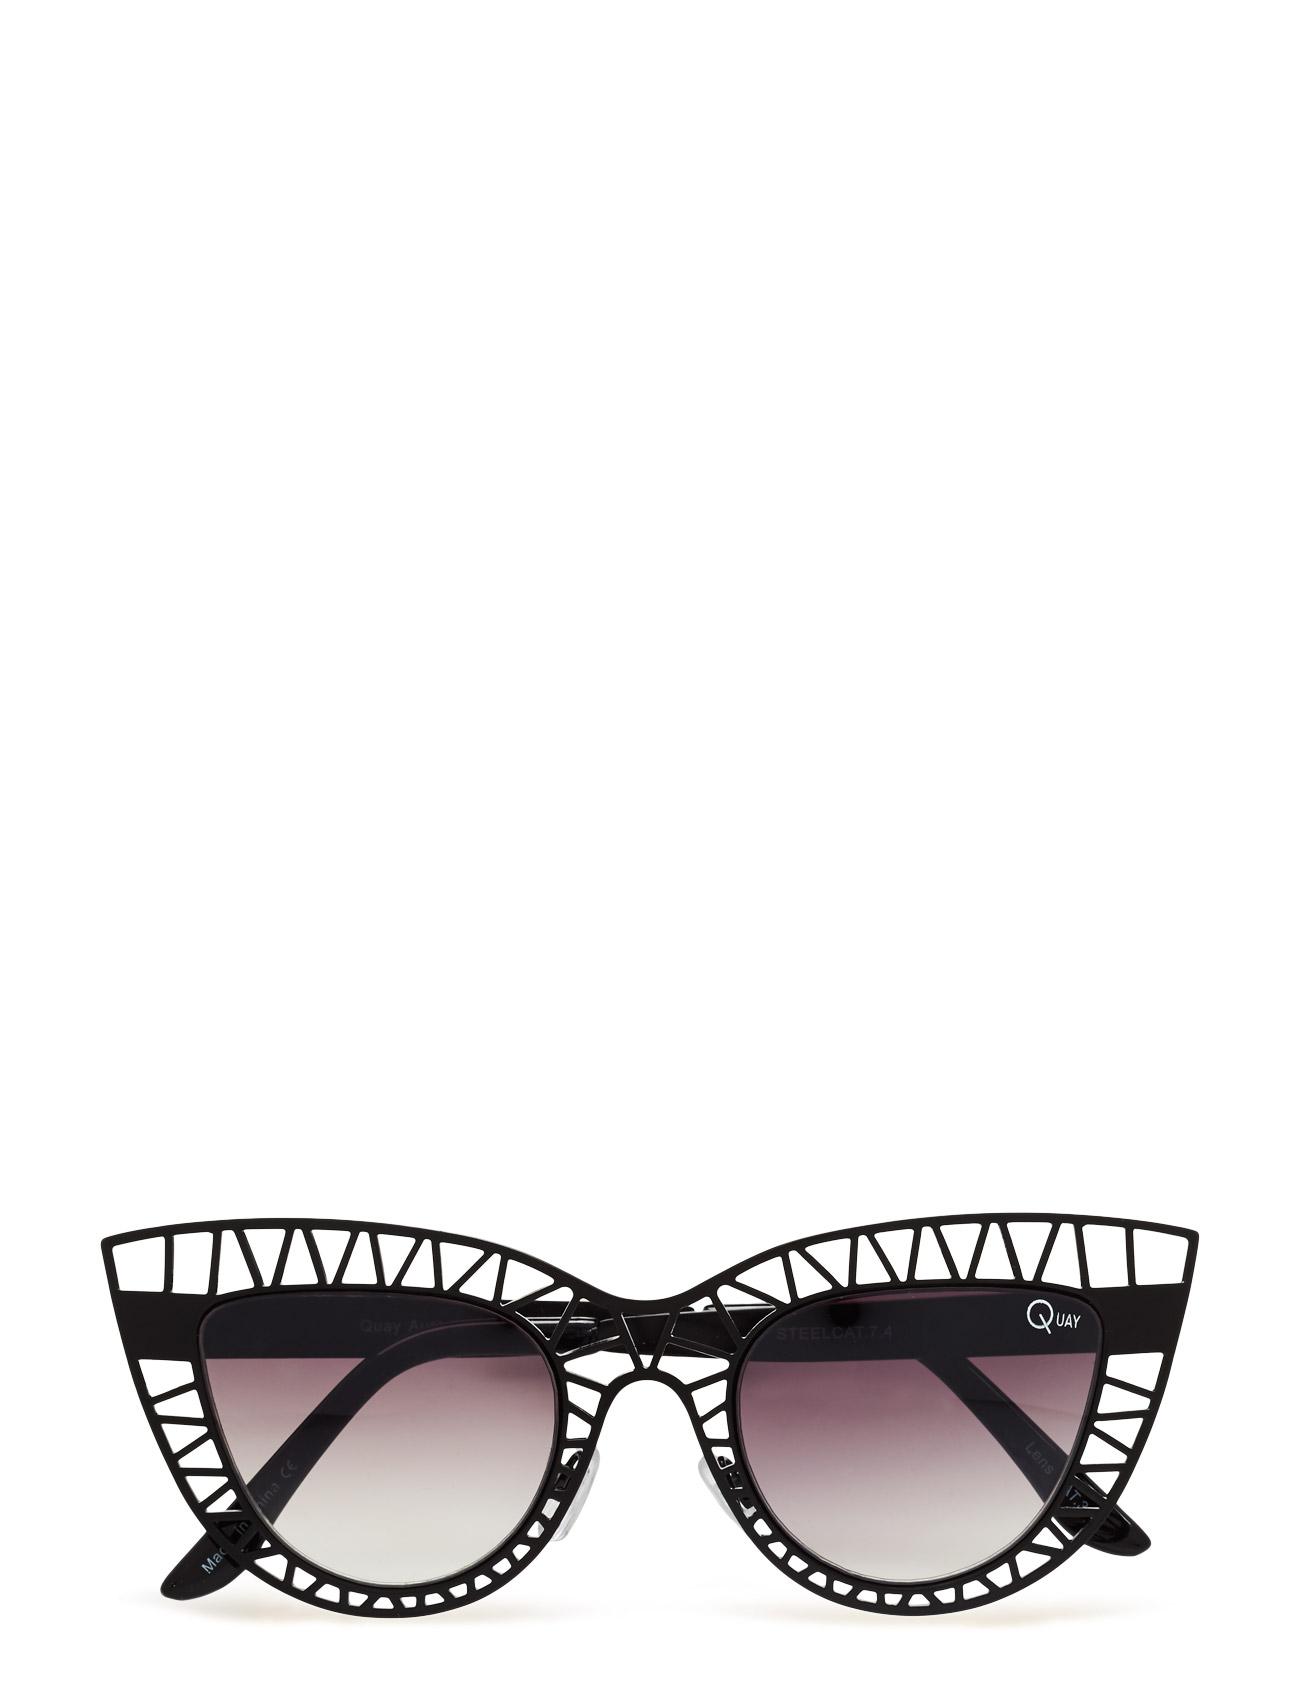 Steelcat QUAY AUSTRALIA Solbriller til Kvinder i Sort